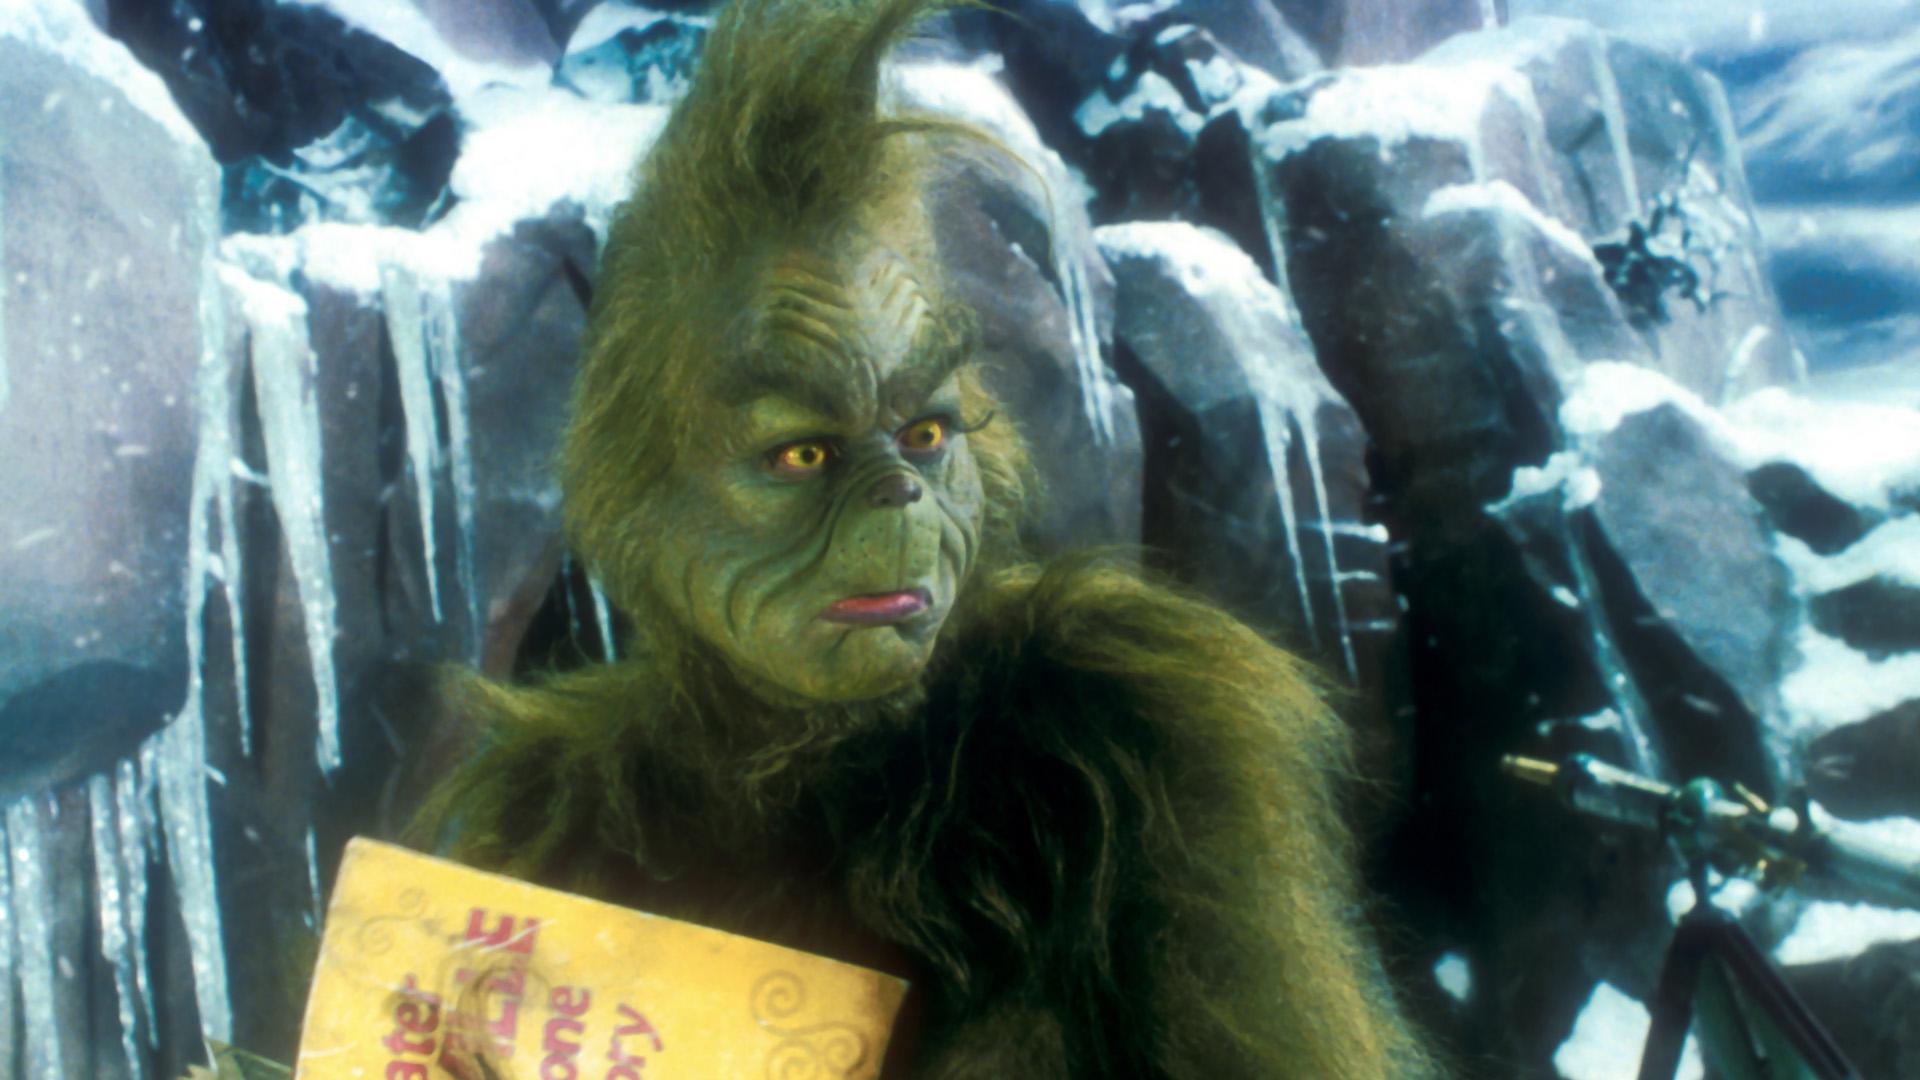 How The Grinch Stole Christmas | Sky.com